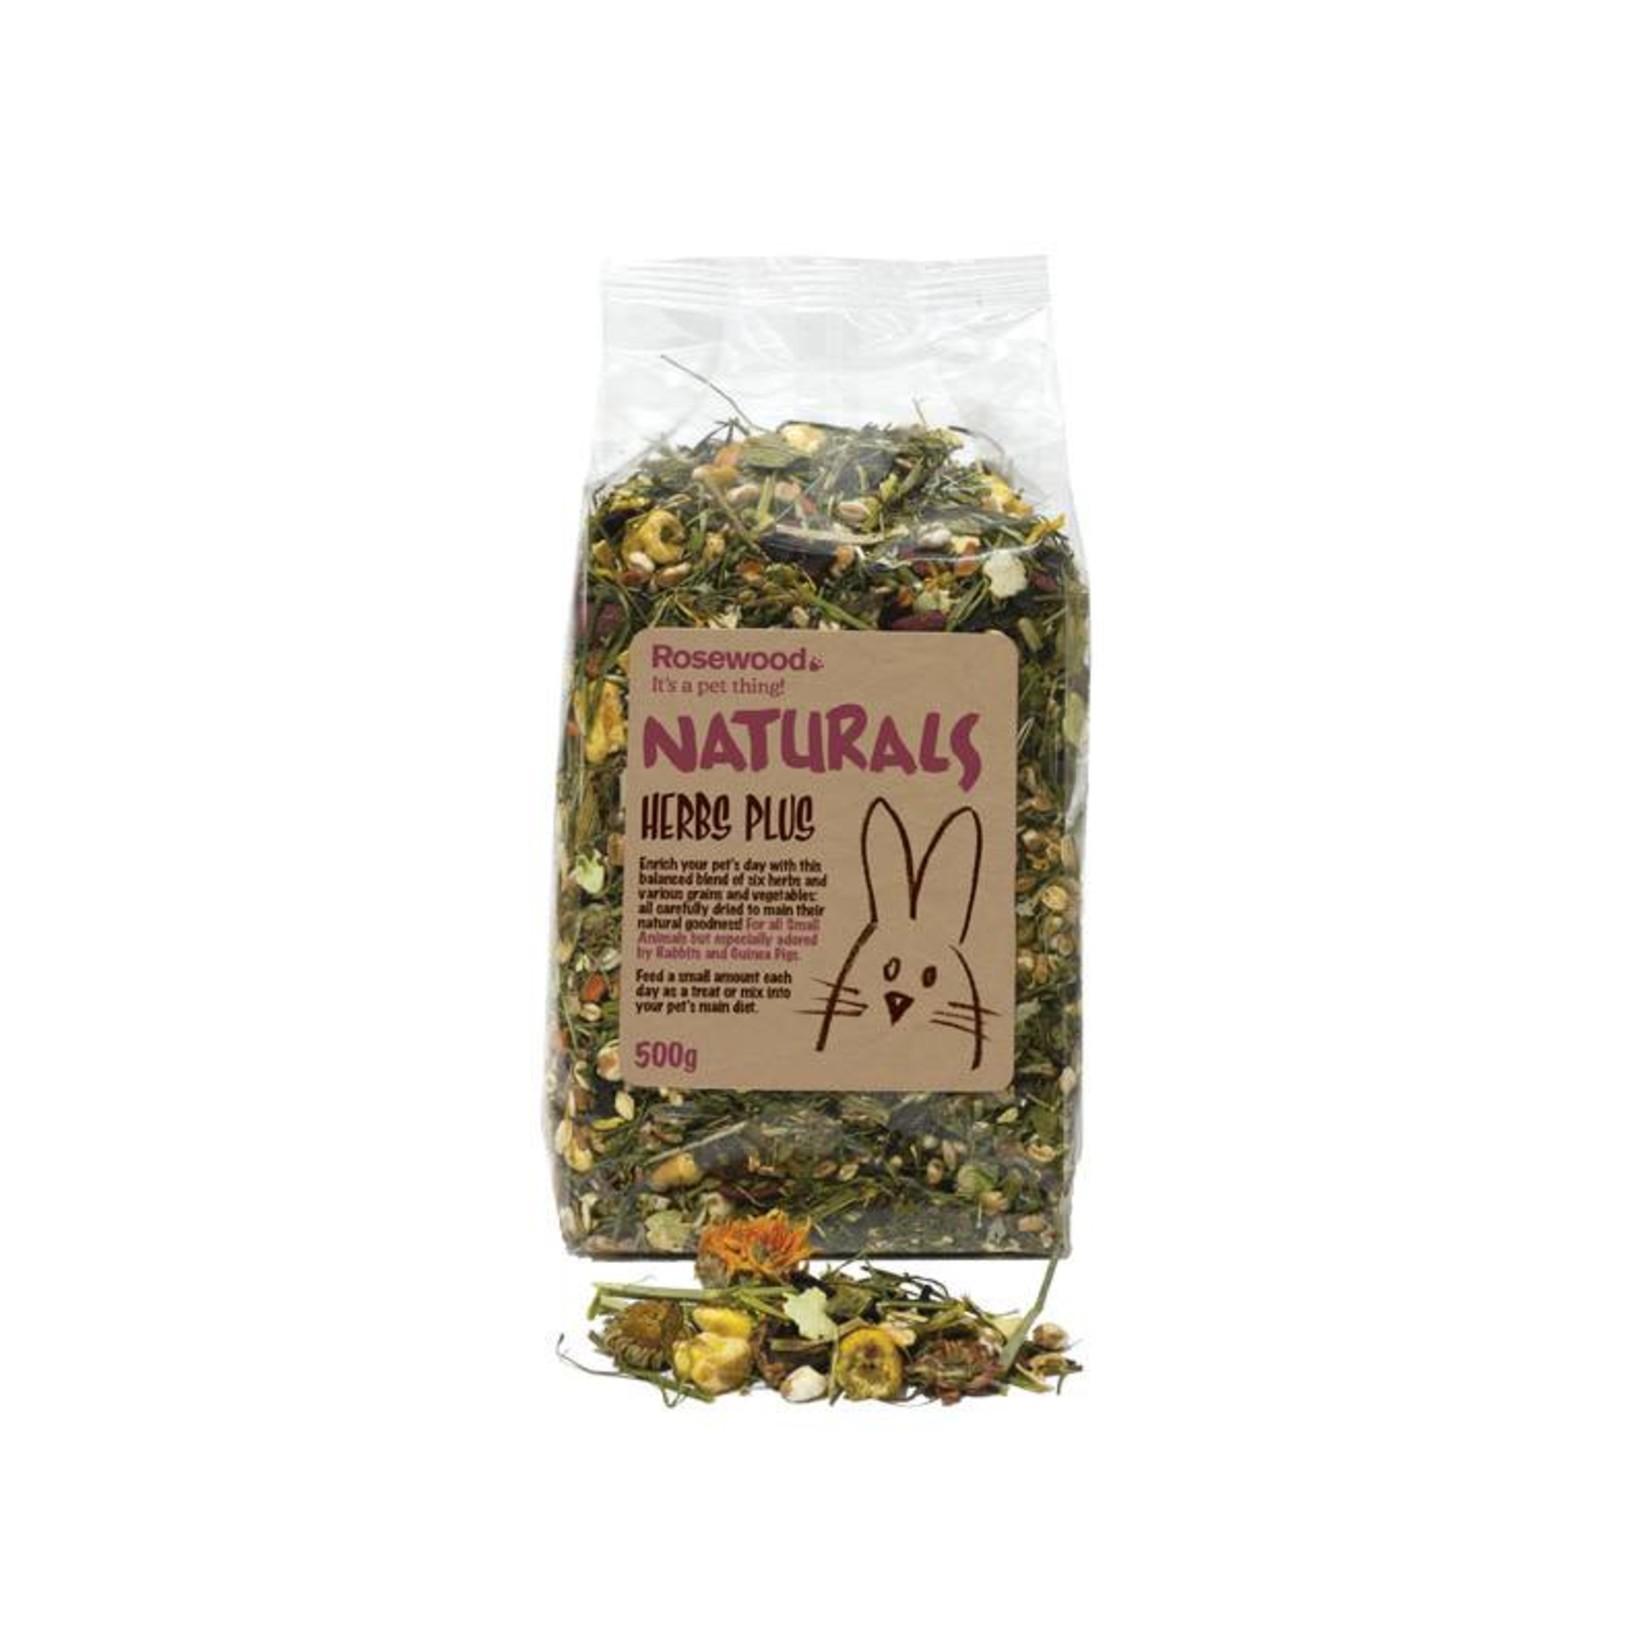 Rosewood Boredom Breaker Naturals Herbs Plus Small Animal Treat, 500g